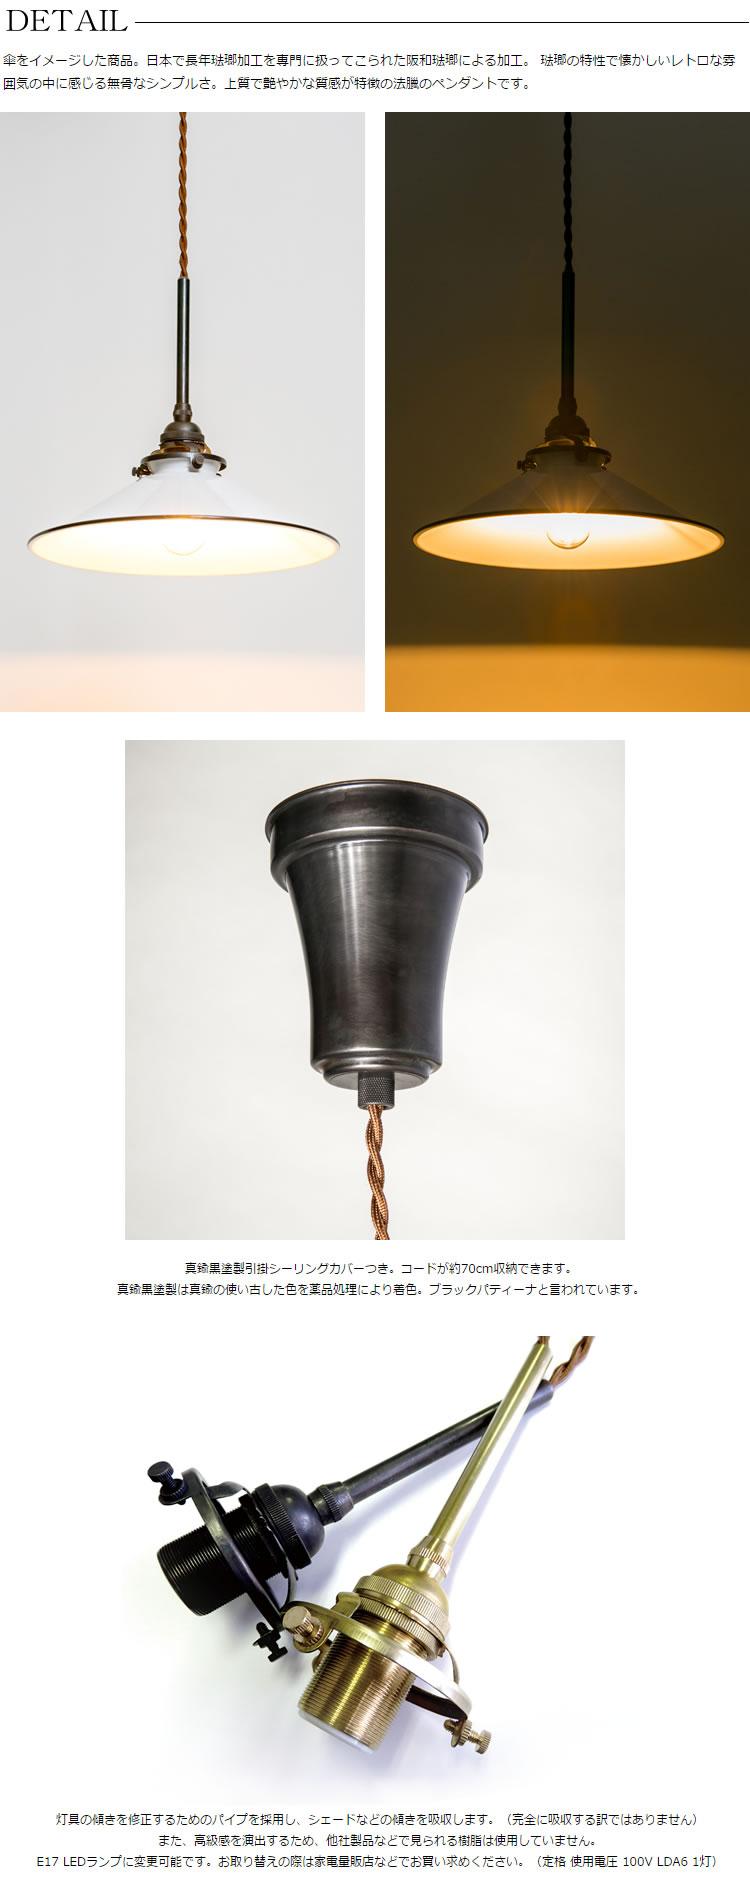 KASA(ホーロー白・ダクト・真鍮)